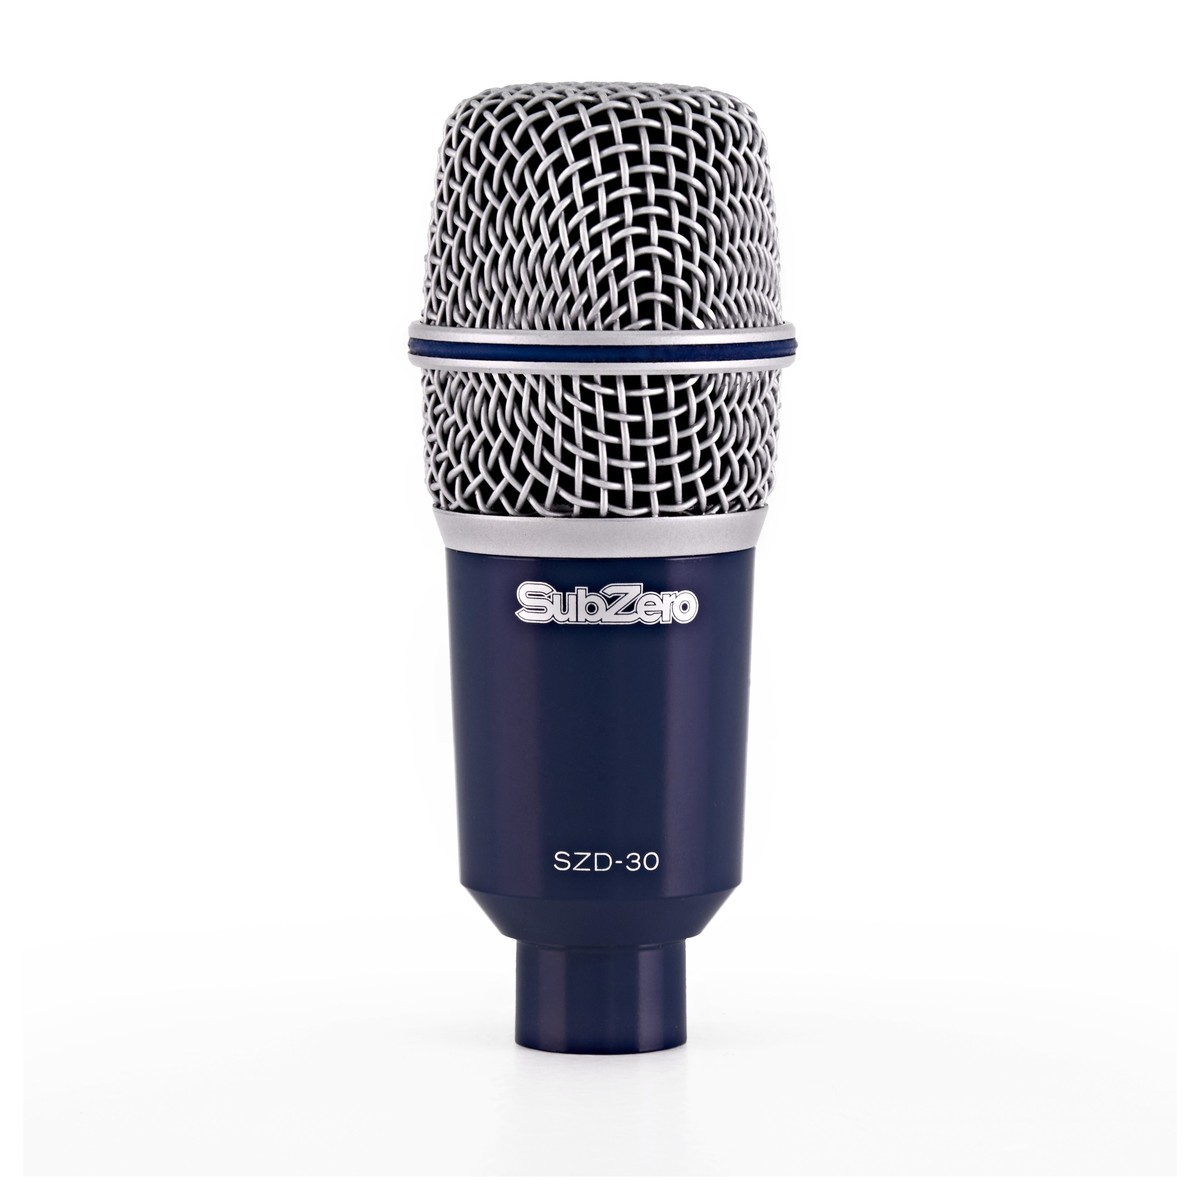 Image of SubZero SZD-30 Dynamic Percussion Microphone